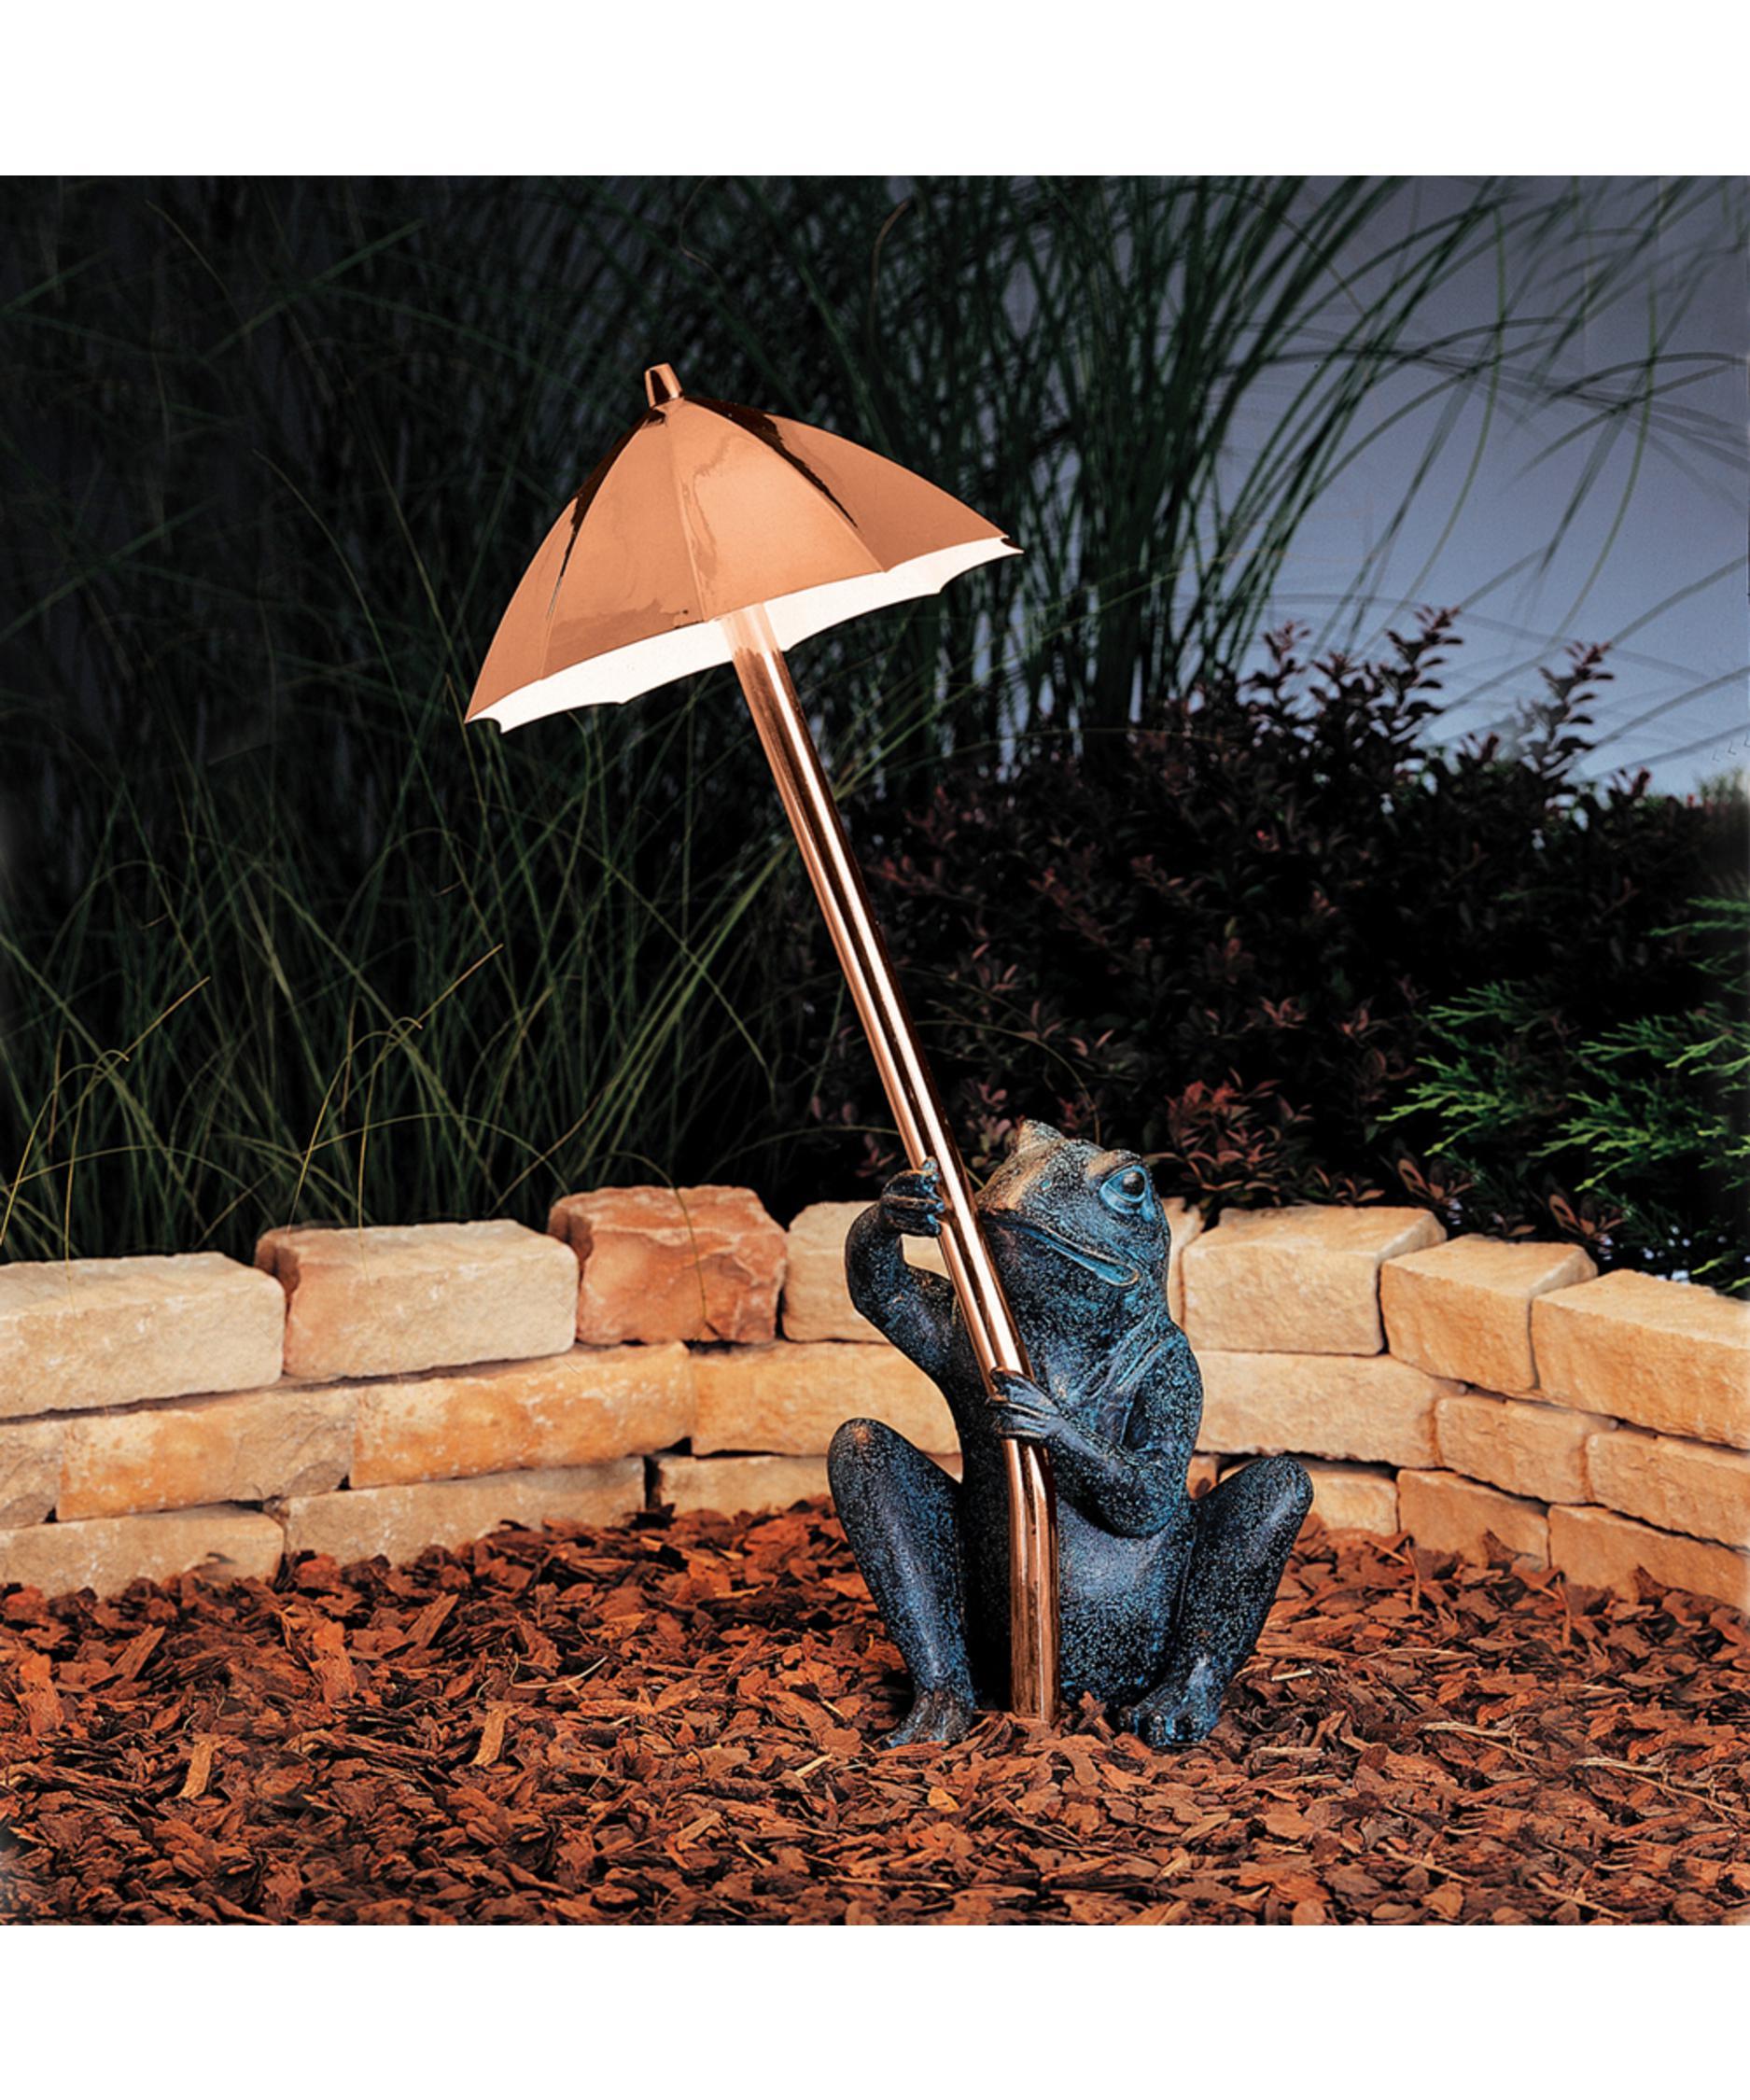 Kichler 15307 Frog And Umbrella 1 Light Pathway Light | Capitol Lighting  1 800lighting.com